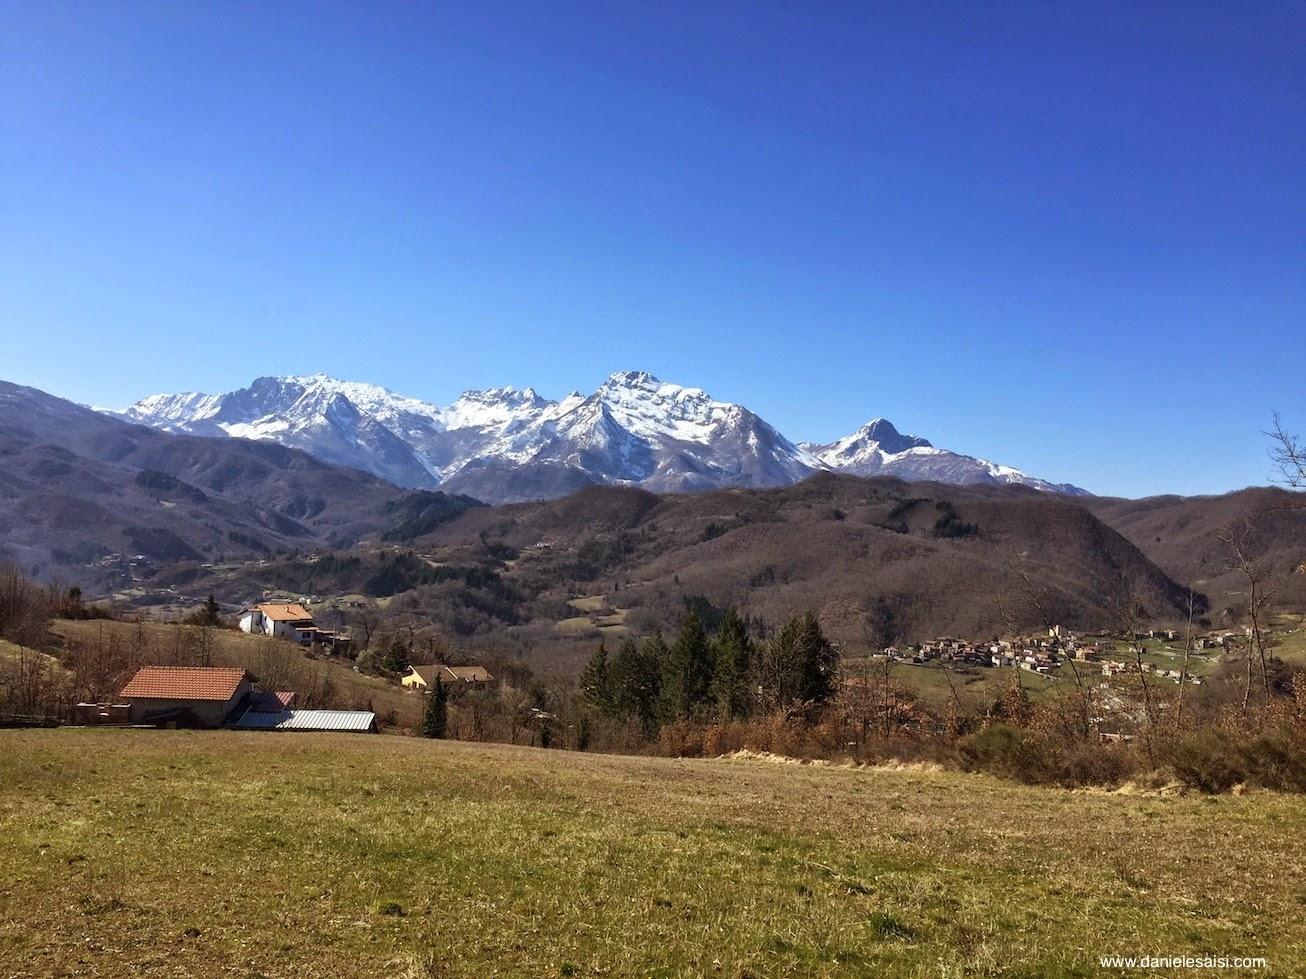 Daniele Saisi Blog: marzo 2015